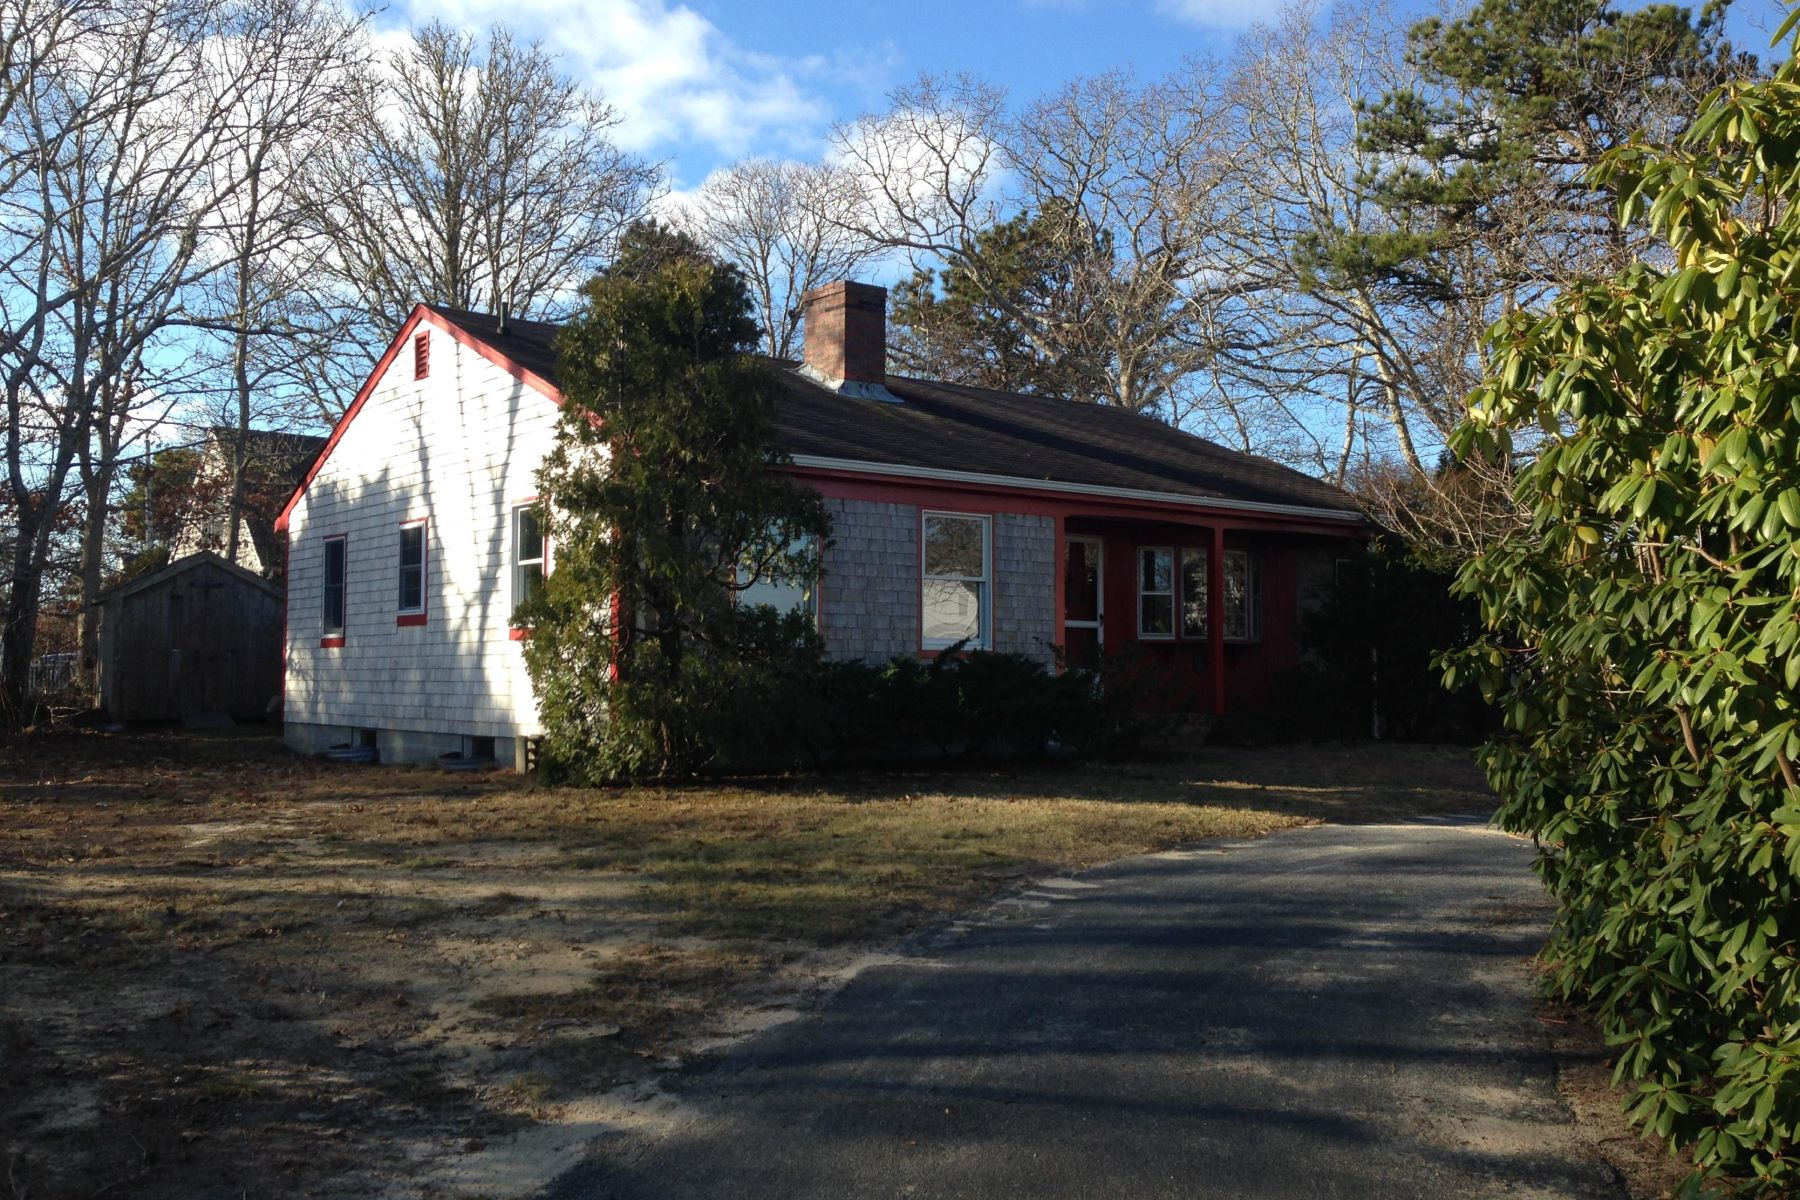 Casa Unifamiliar por un Venta en 111 Bishops Terrace, Chatham, MA Chatham, Massachusetts, 02633 Estados Unidos